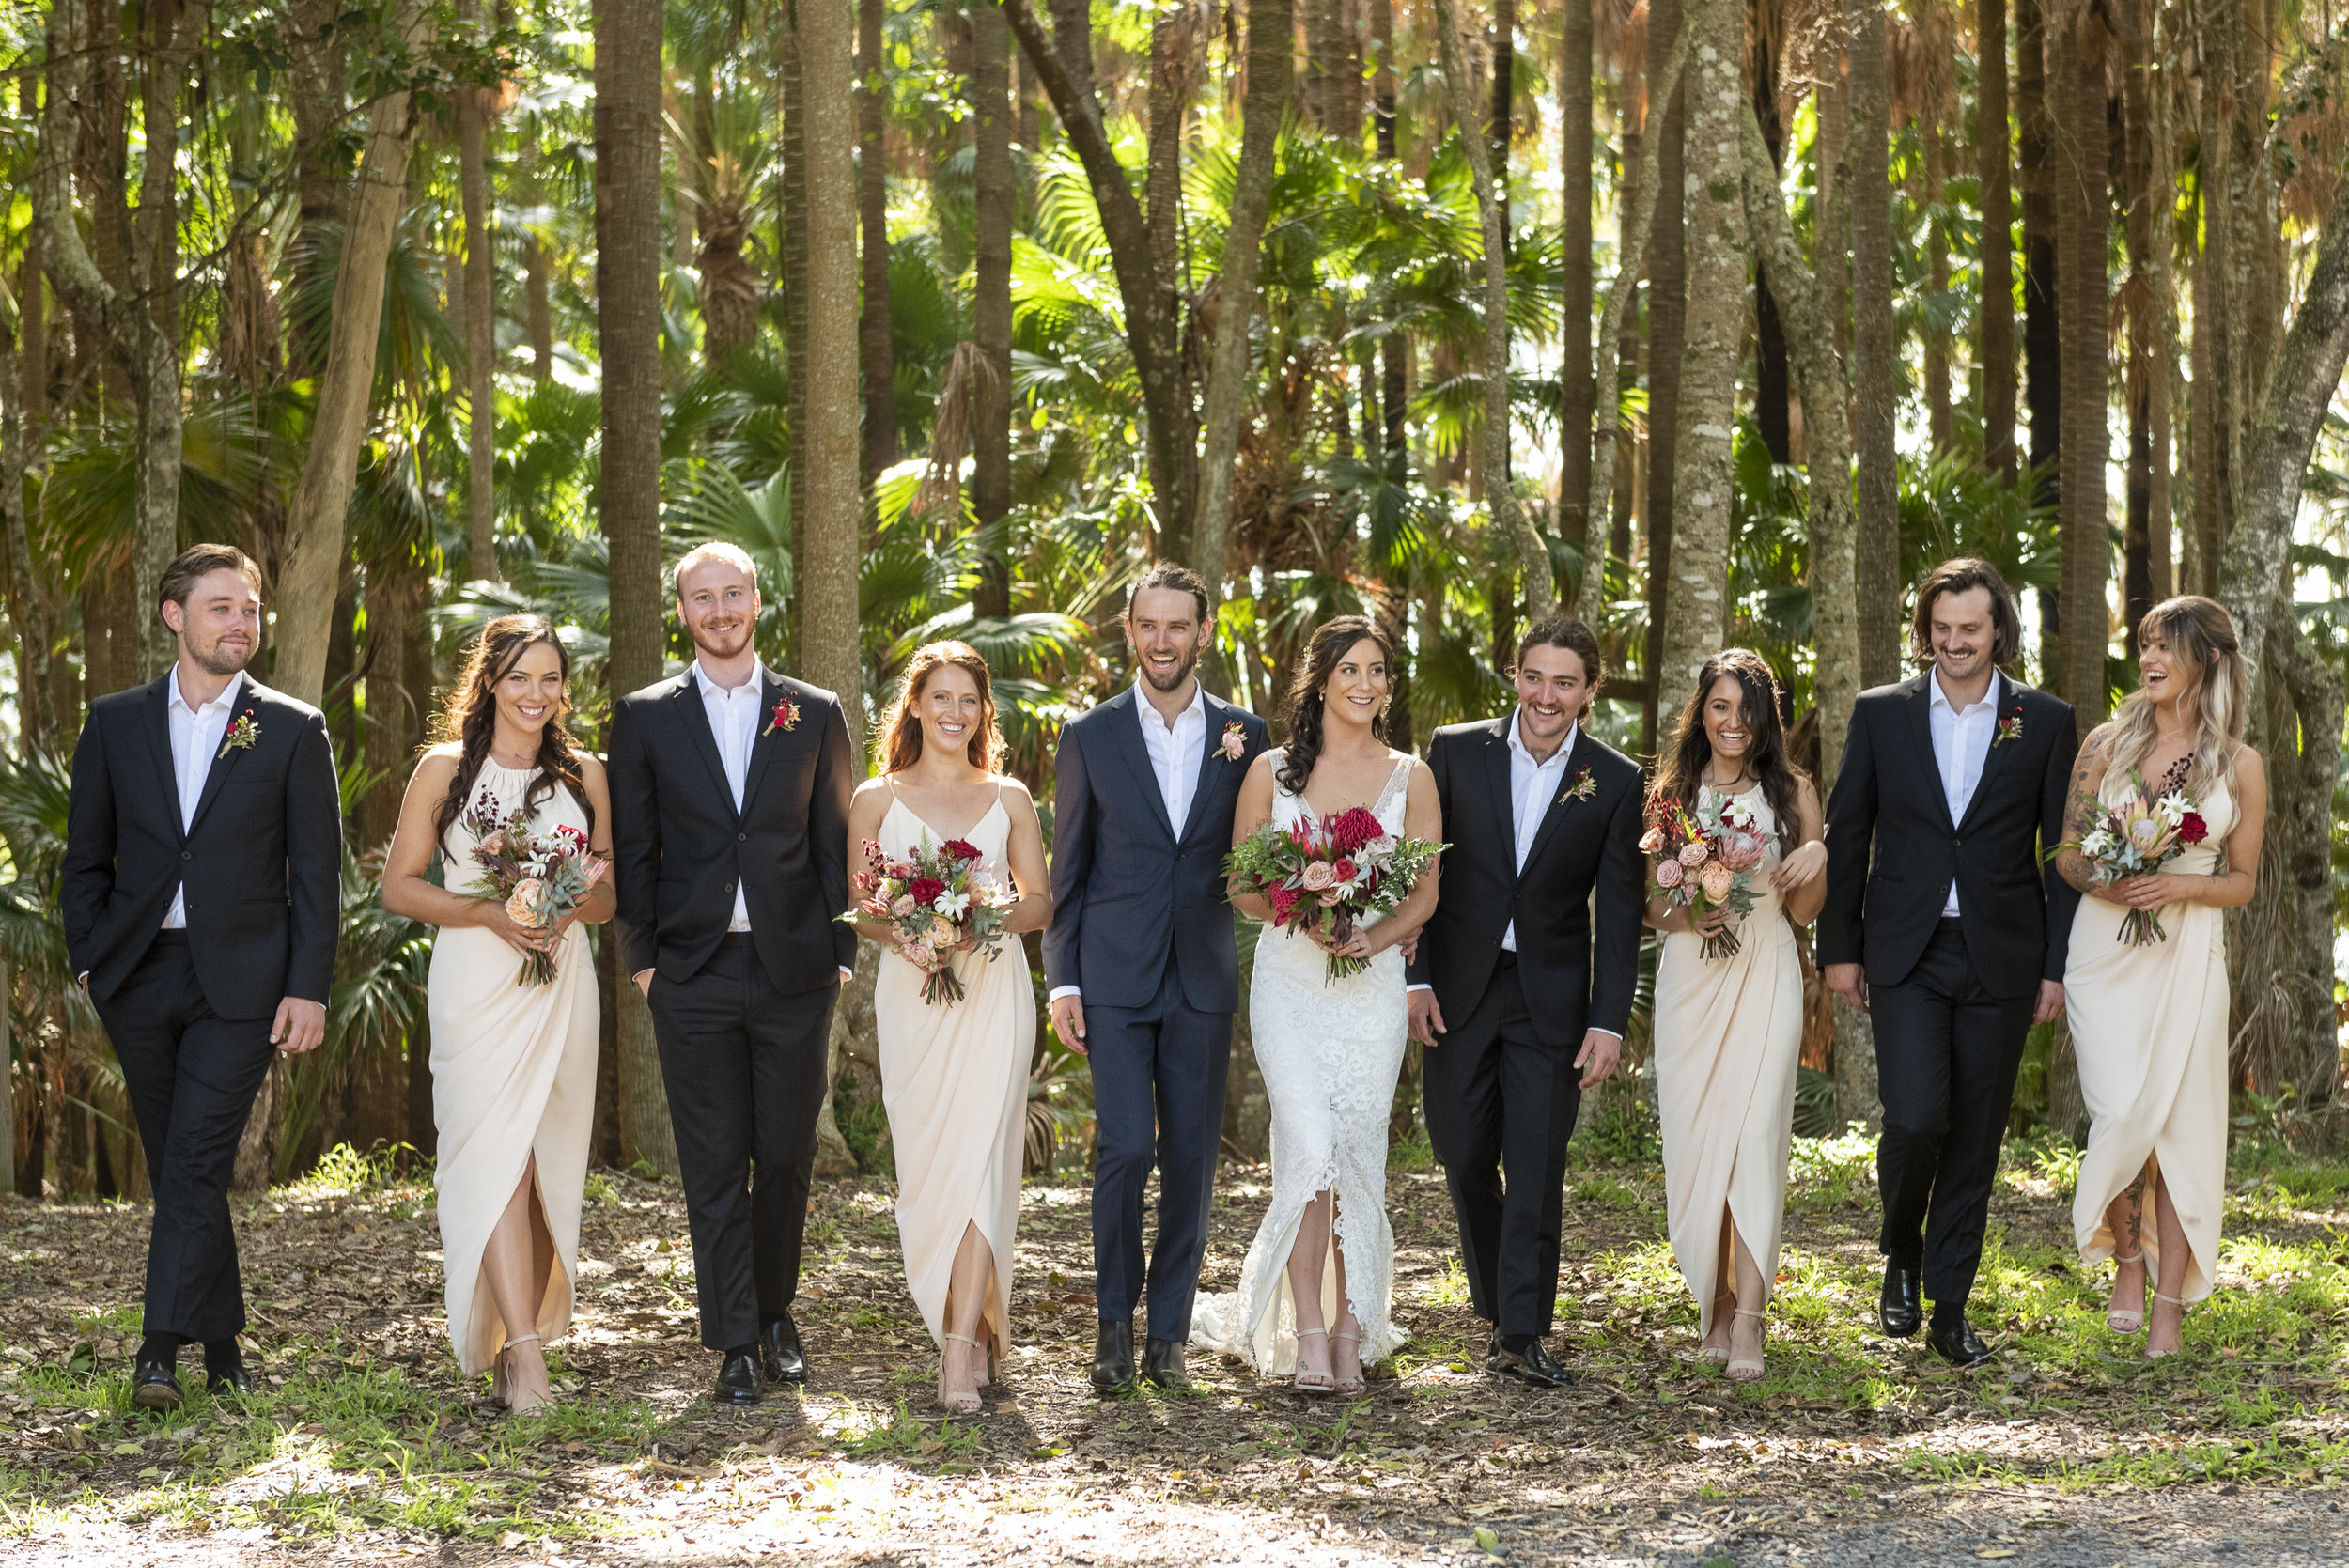 weddings by atelier photography-wedding-01-3.jpg